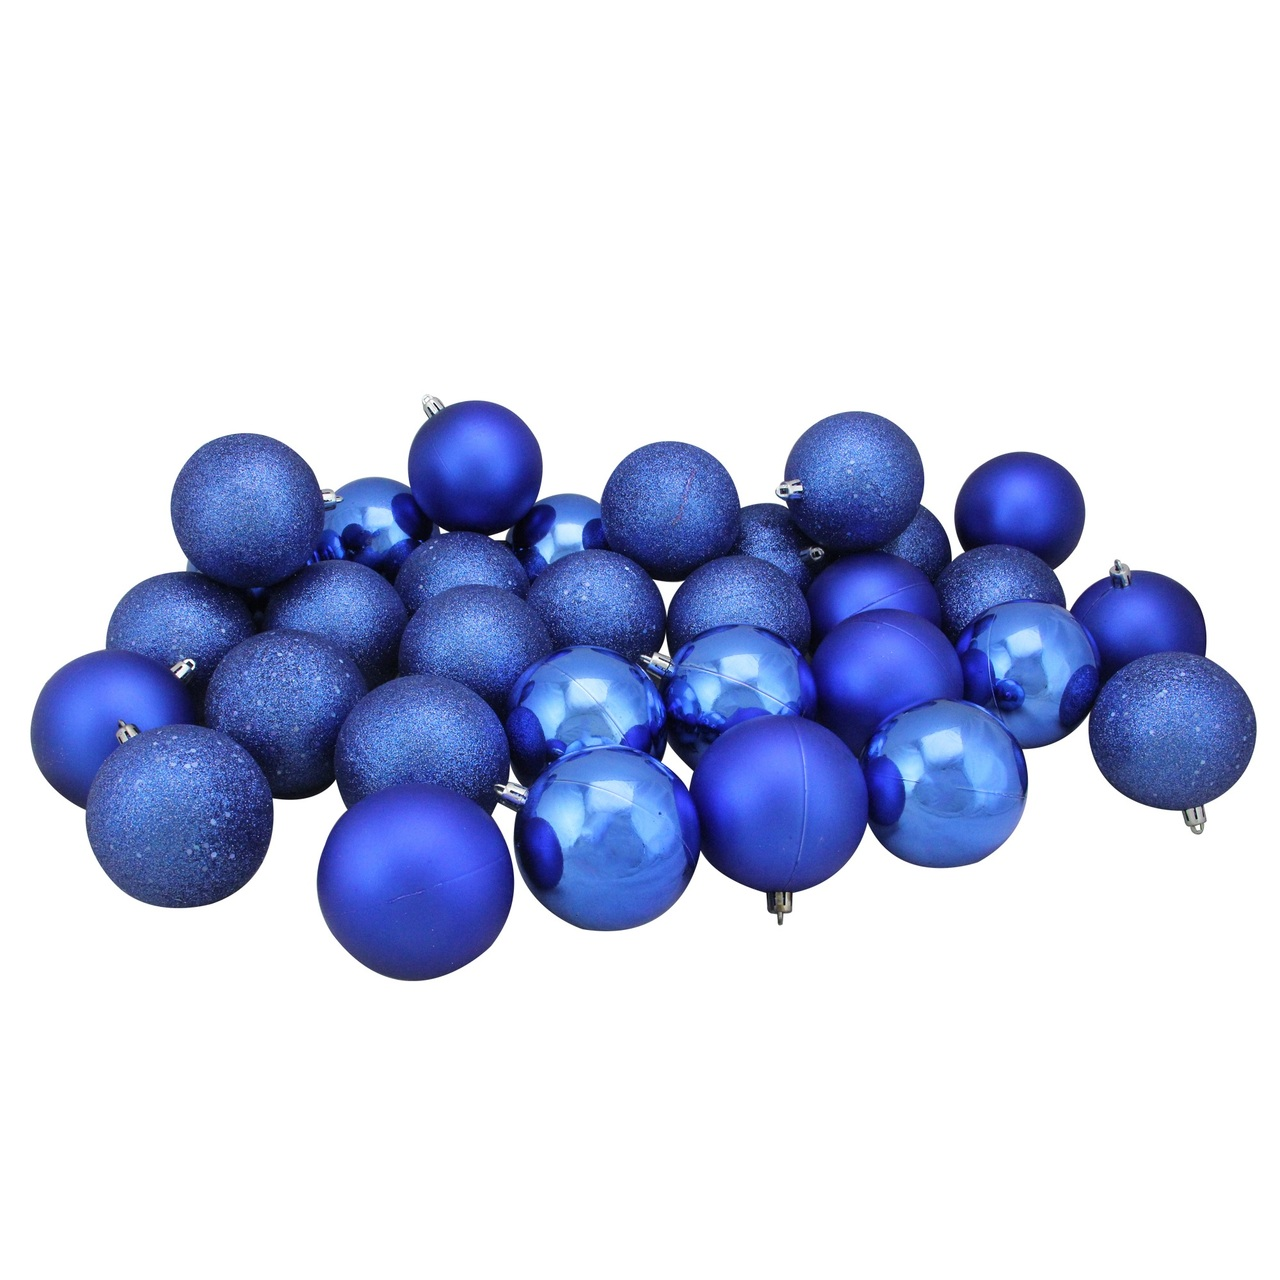 32ct Lavish Blue Shatterproof 4 Finish Christmas Ball Ornaments 3 25 80mm Christmas Central